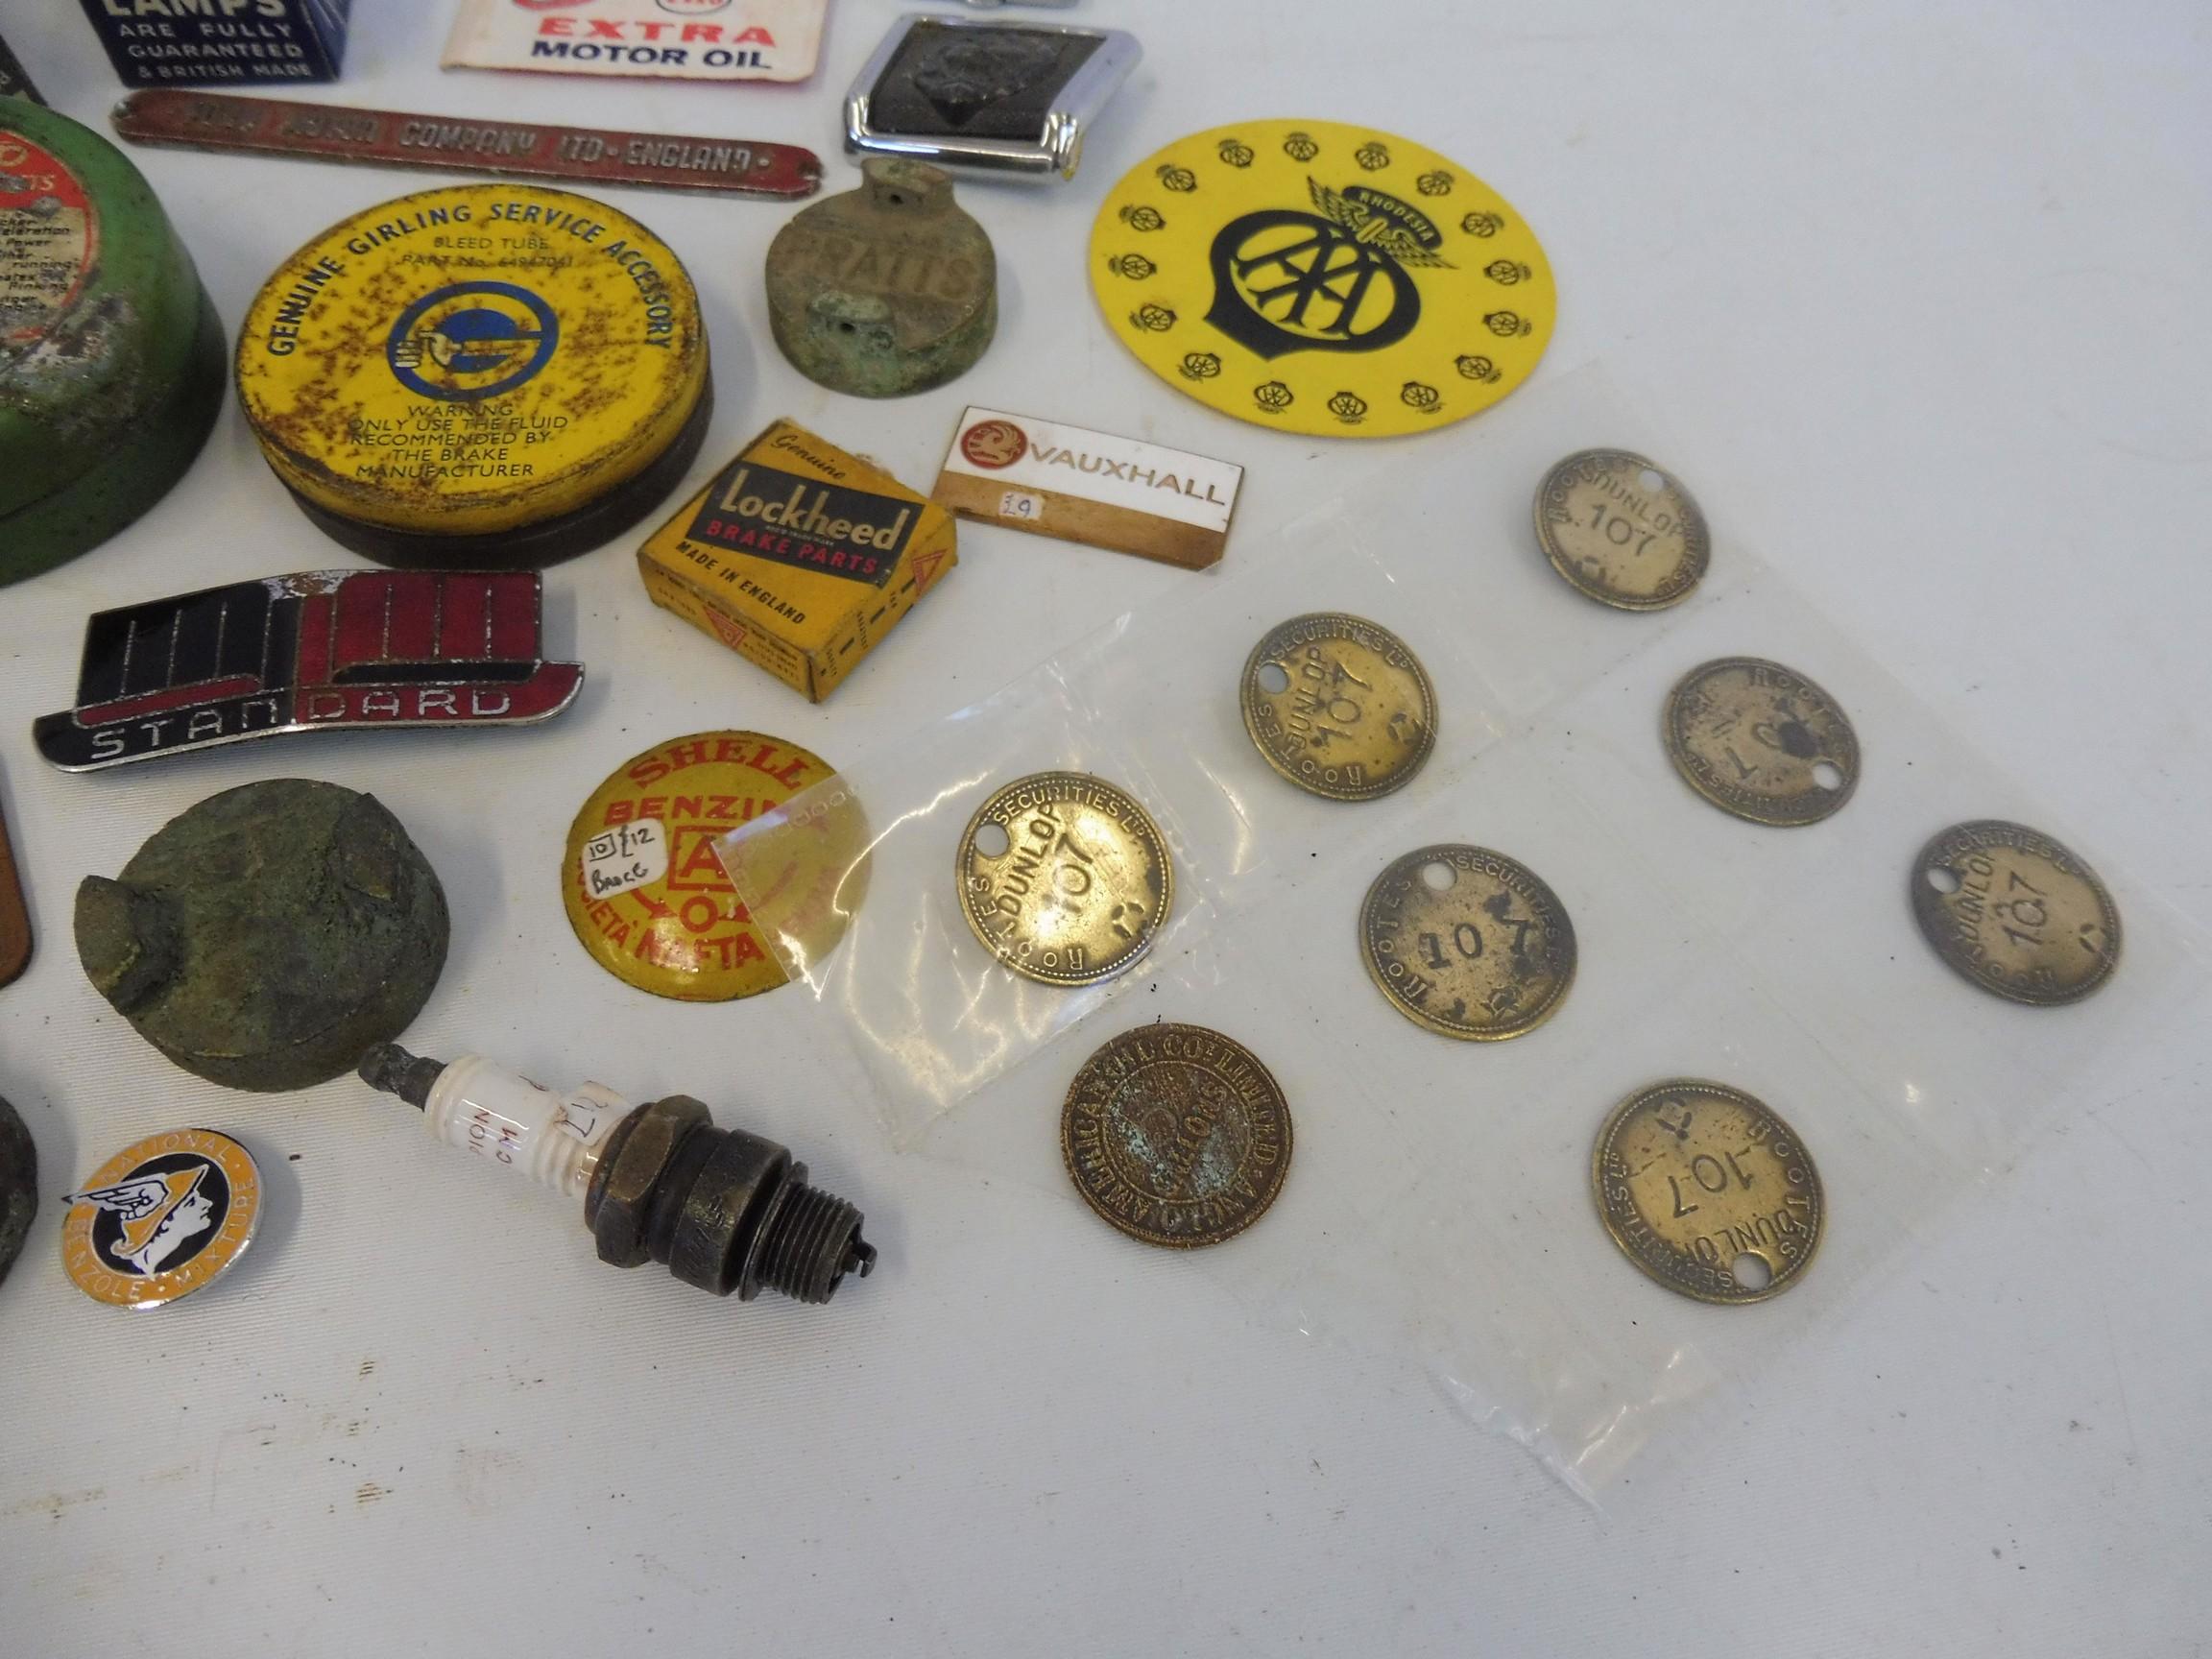 A Fibrax Brake Blocks dispensing tin with mixed contents. - Image 4 of 8